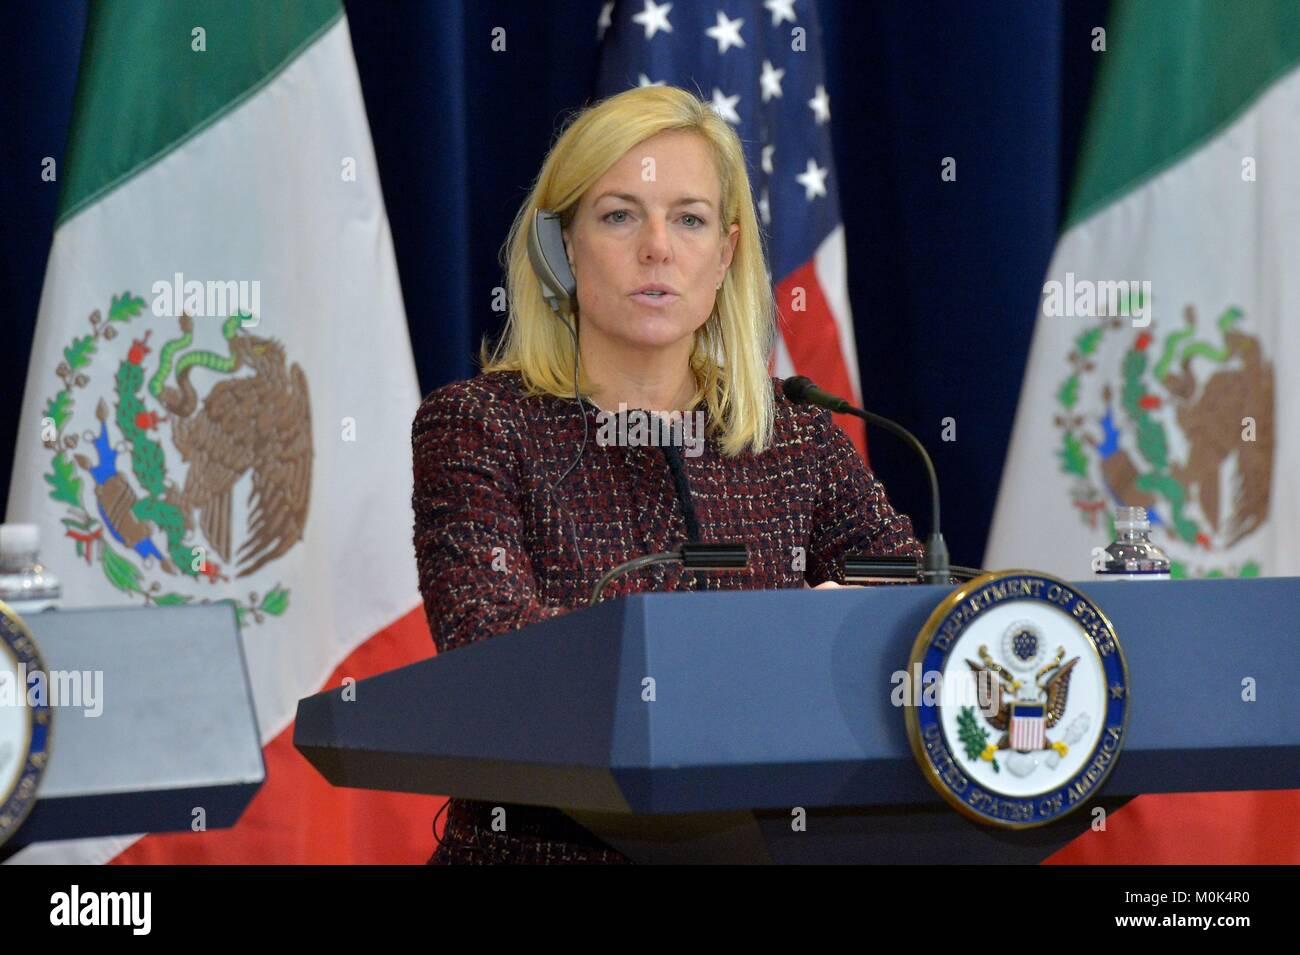 U.S. Homeland Security Secretary Kirstijen Nielsen speaks during the second U.S.-Mexico Strategic Dialogue on Disrupting - Stock Image